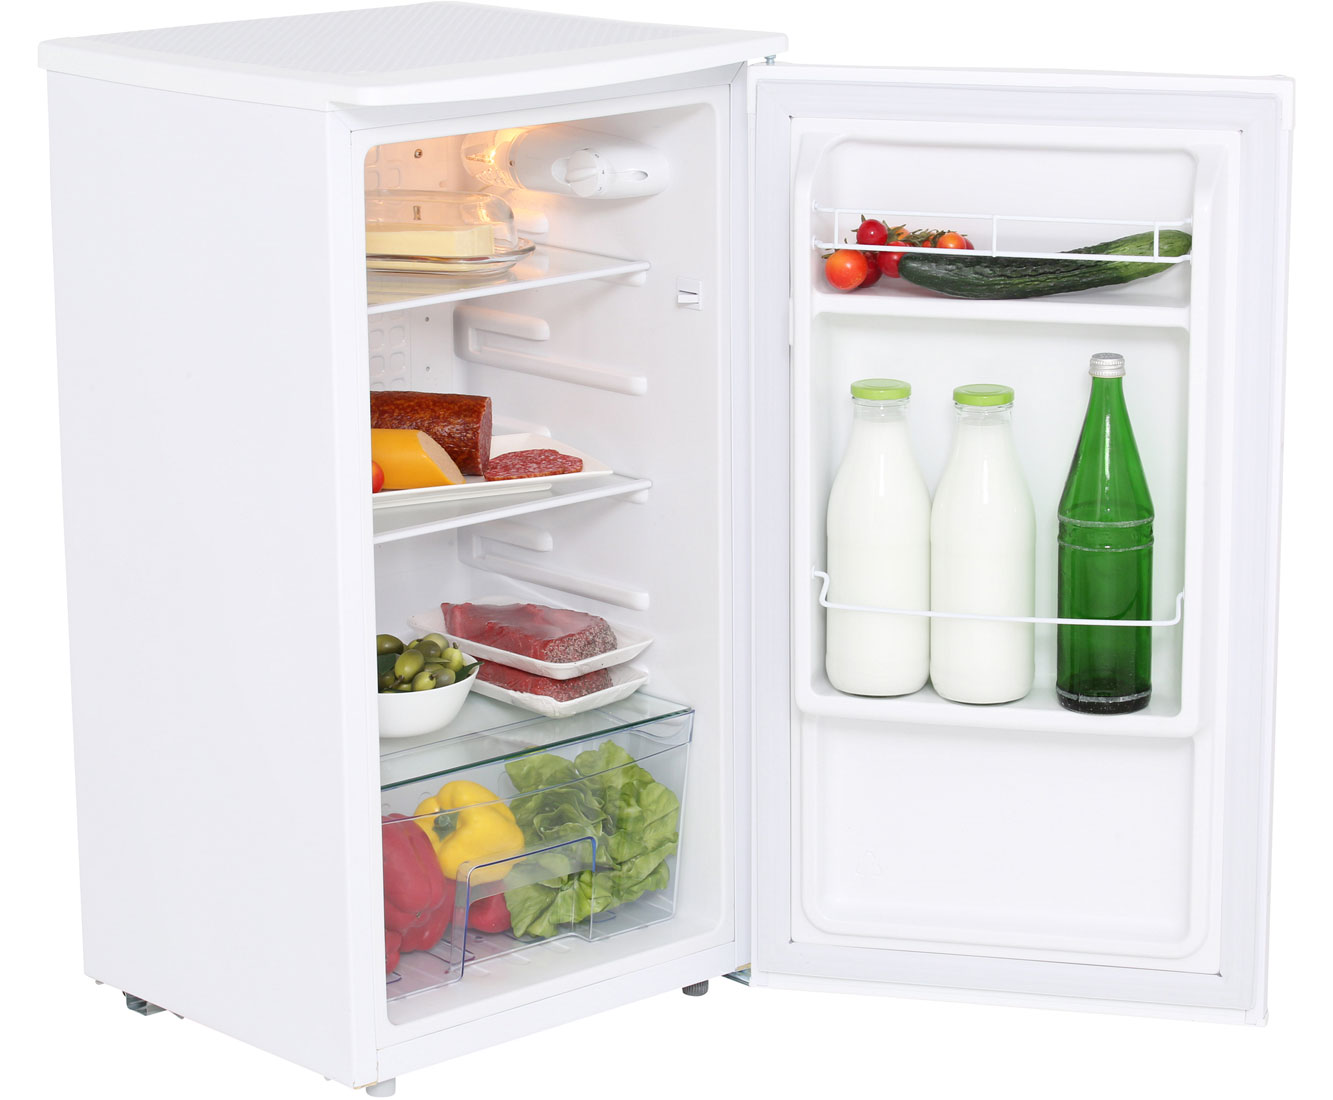 Exquisit KS 85-9 RVA+ Kühlschrank - Weiß, A+